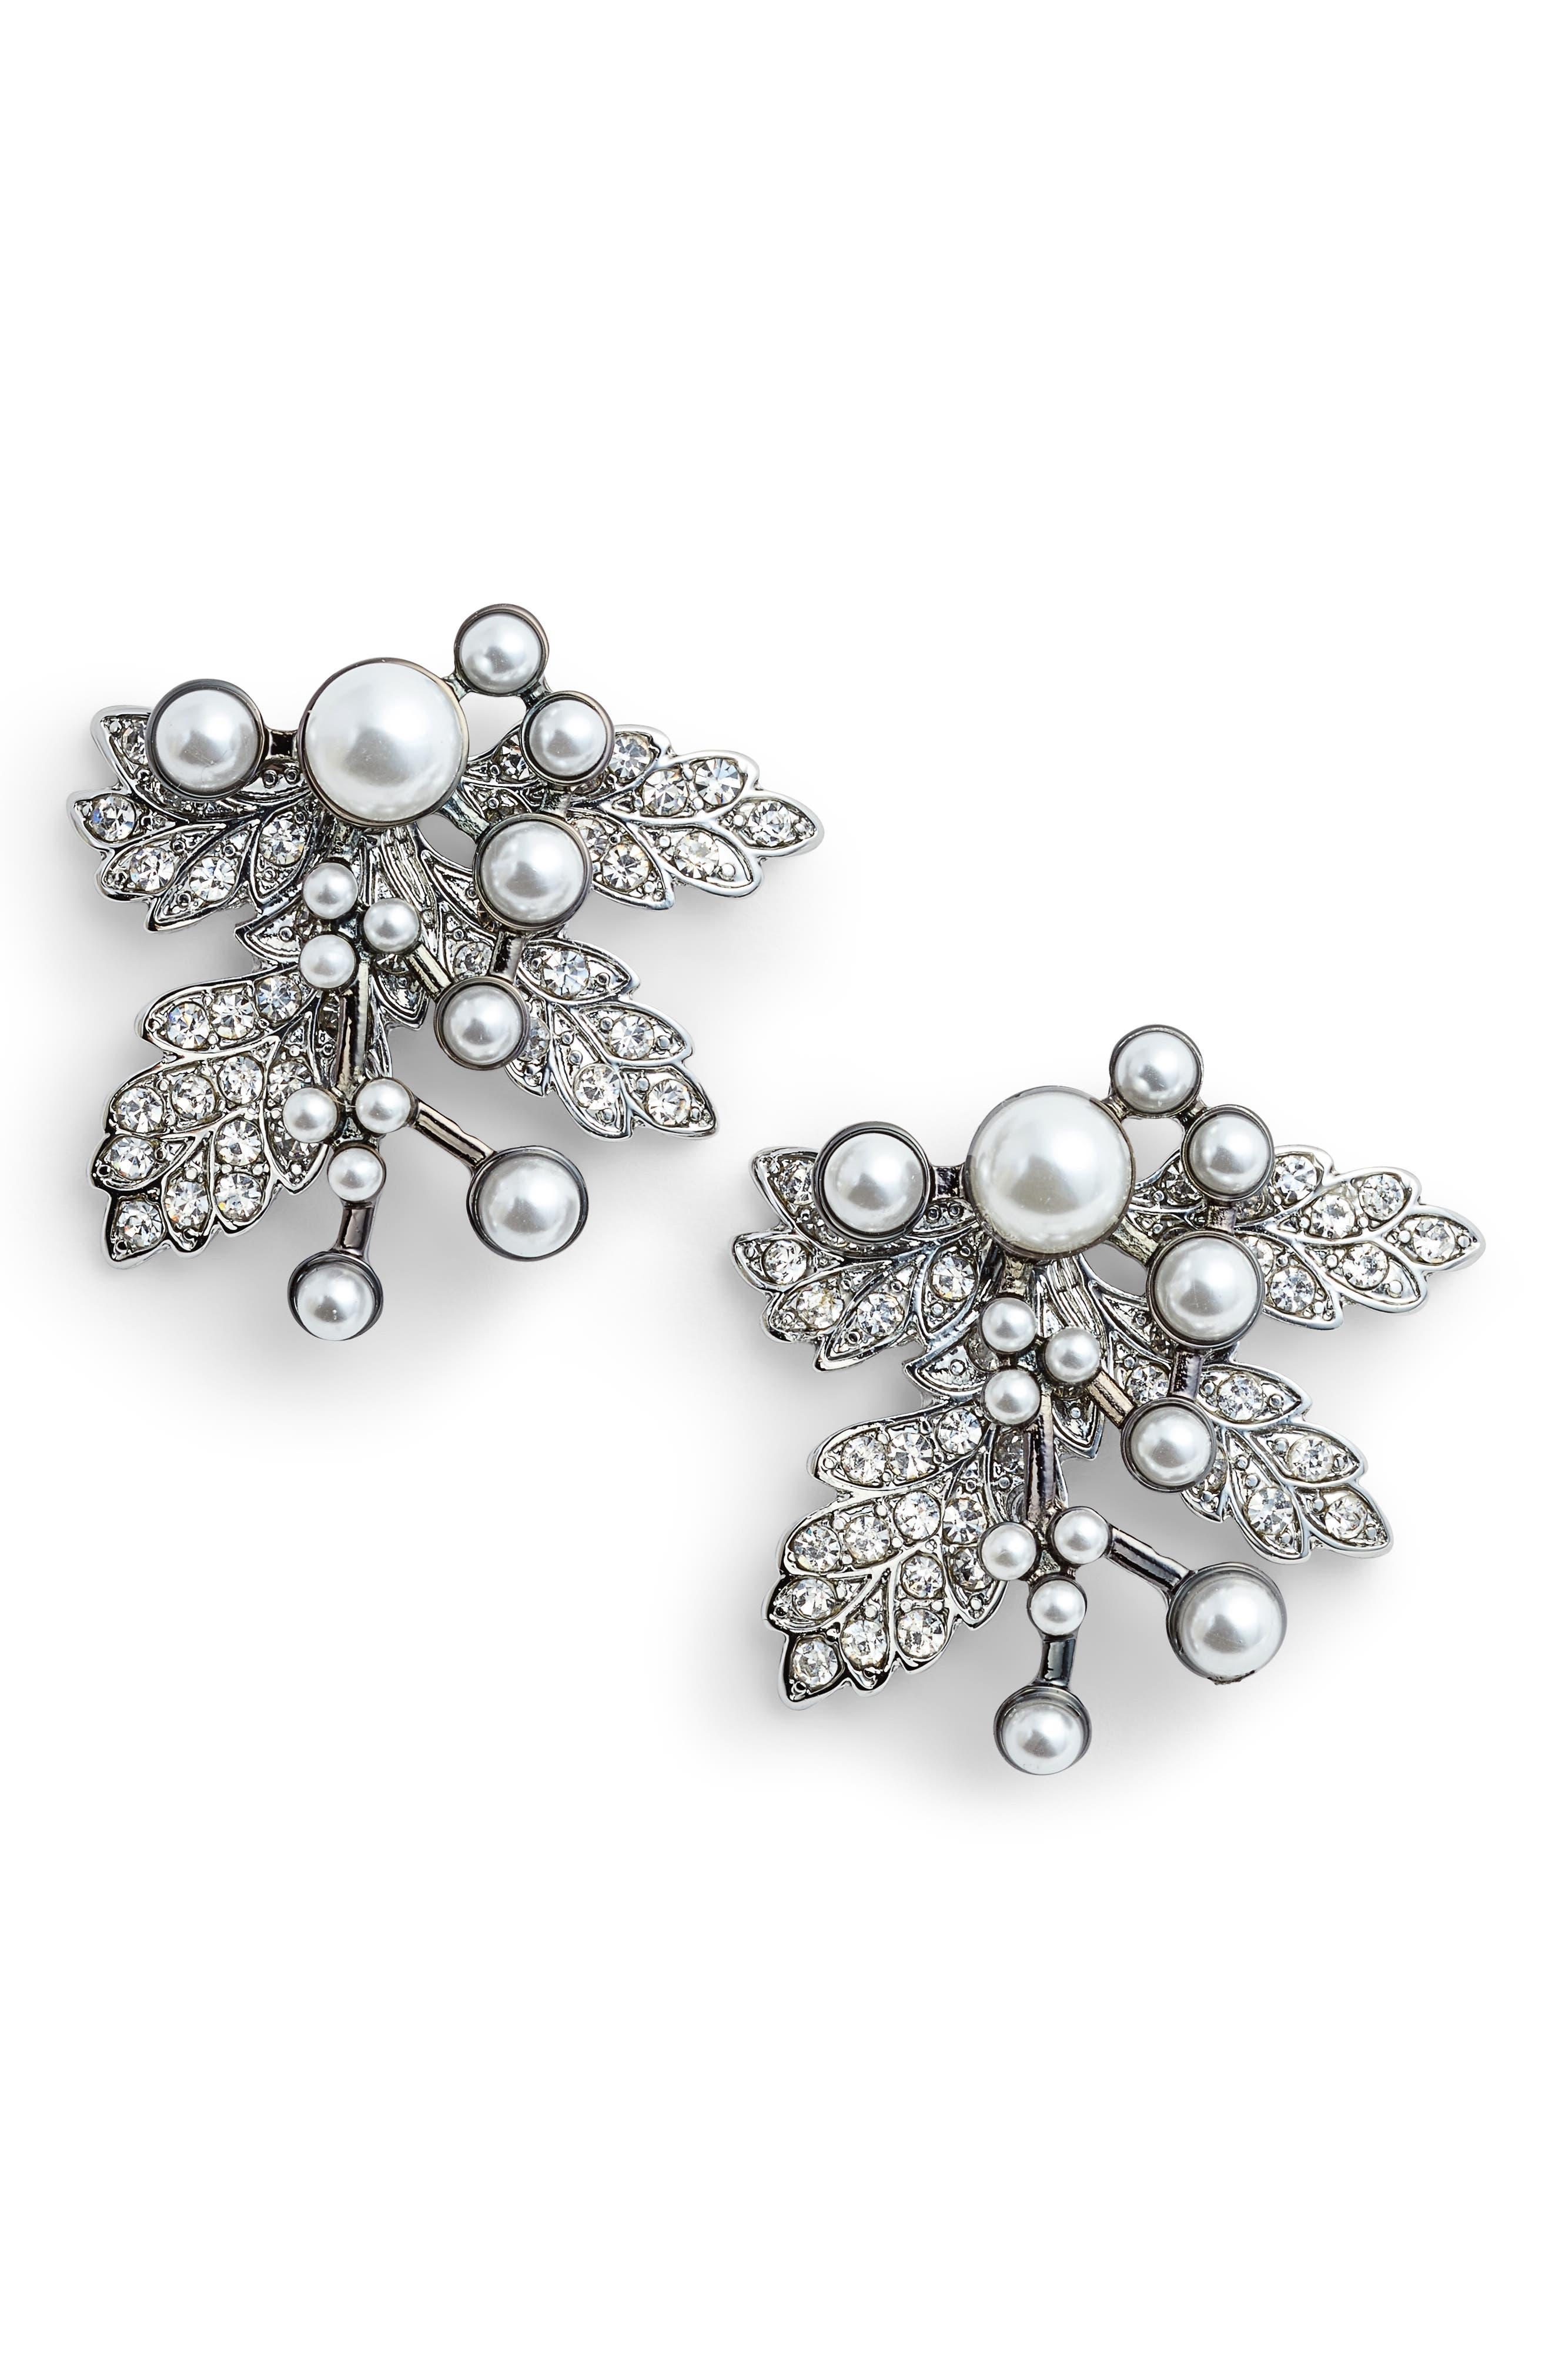 Main Image - Badgley Mischka Imitation Pearl Crystal Leaf Earrings